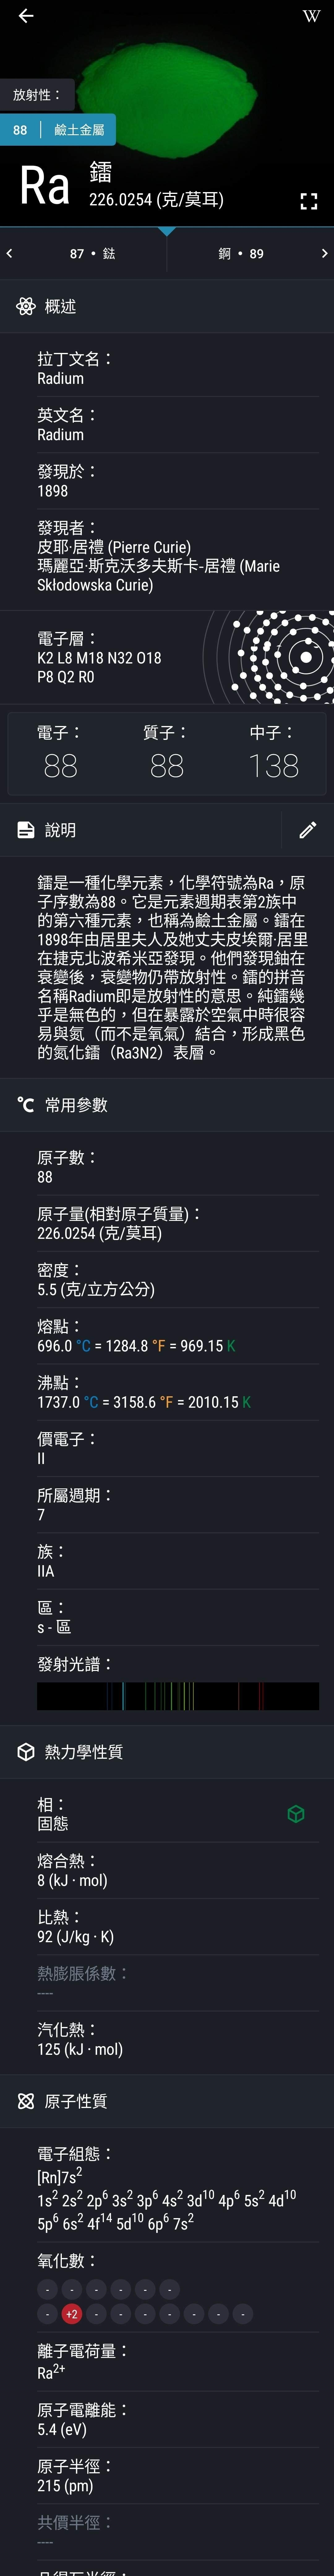 194701g6c1jyg3nb6ycl4m